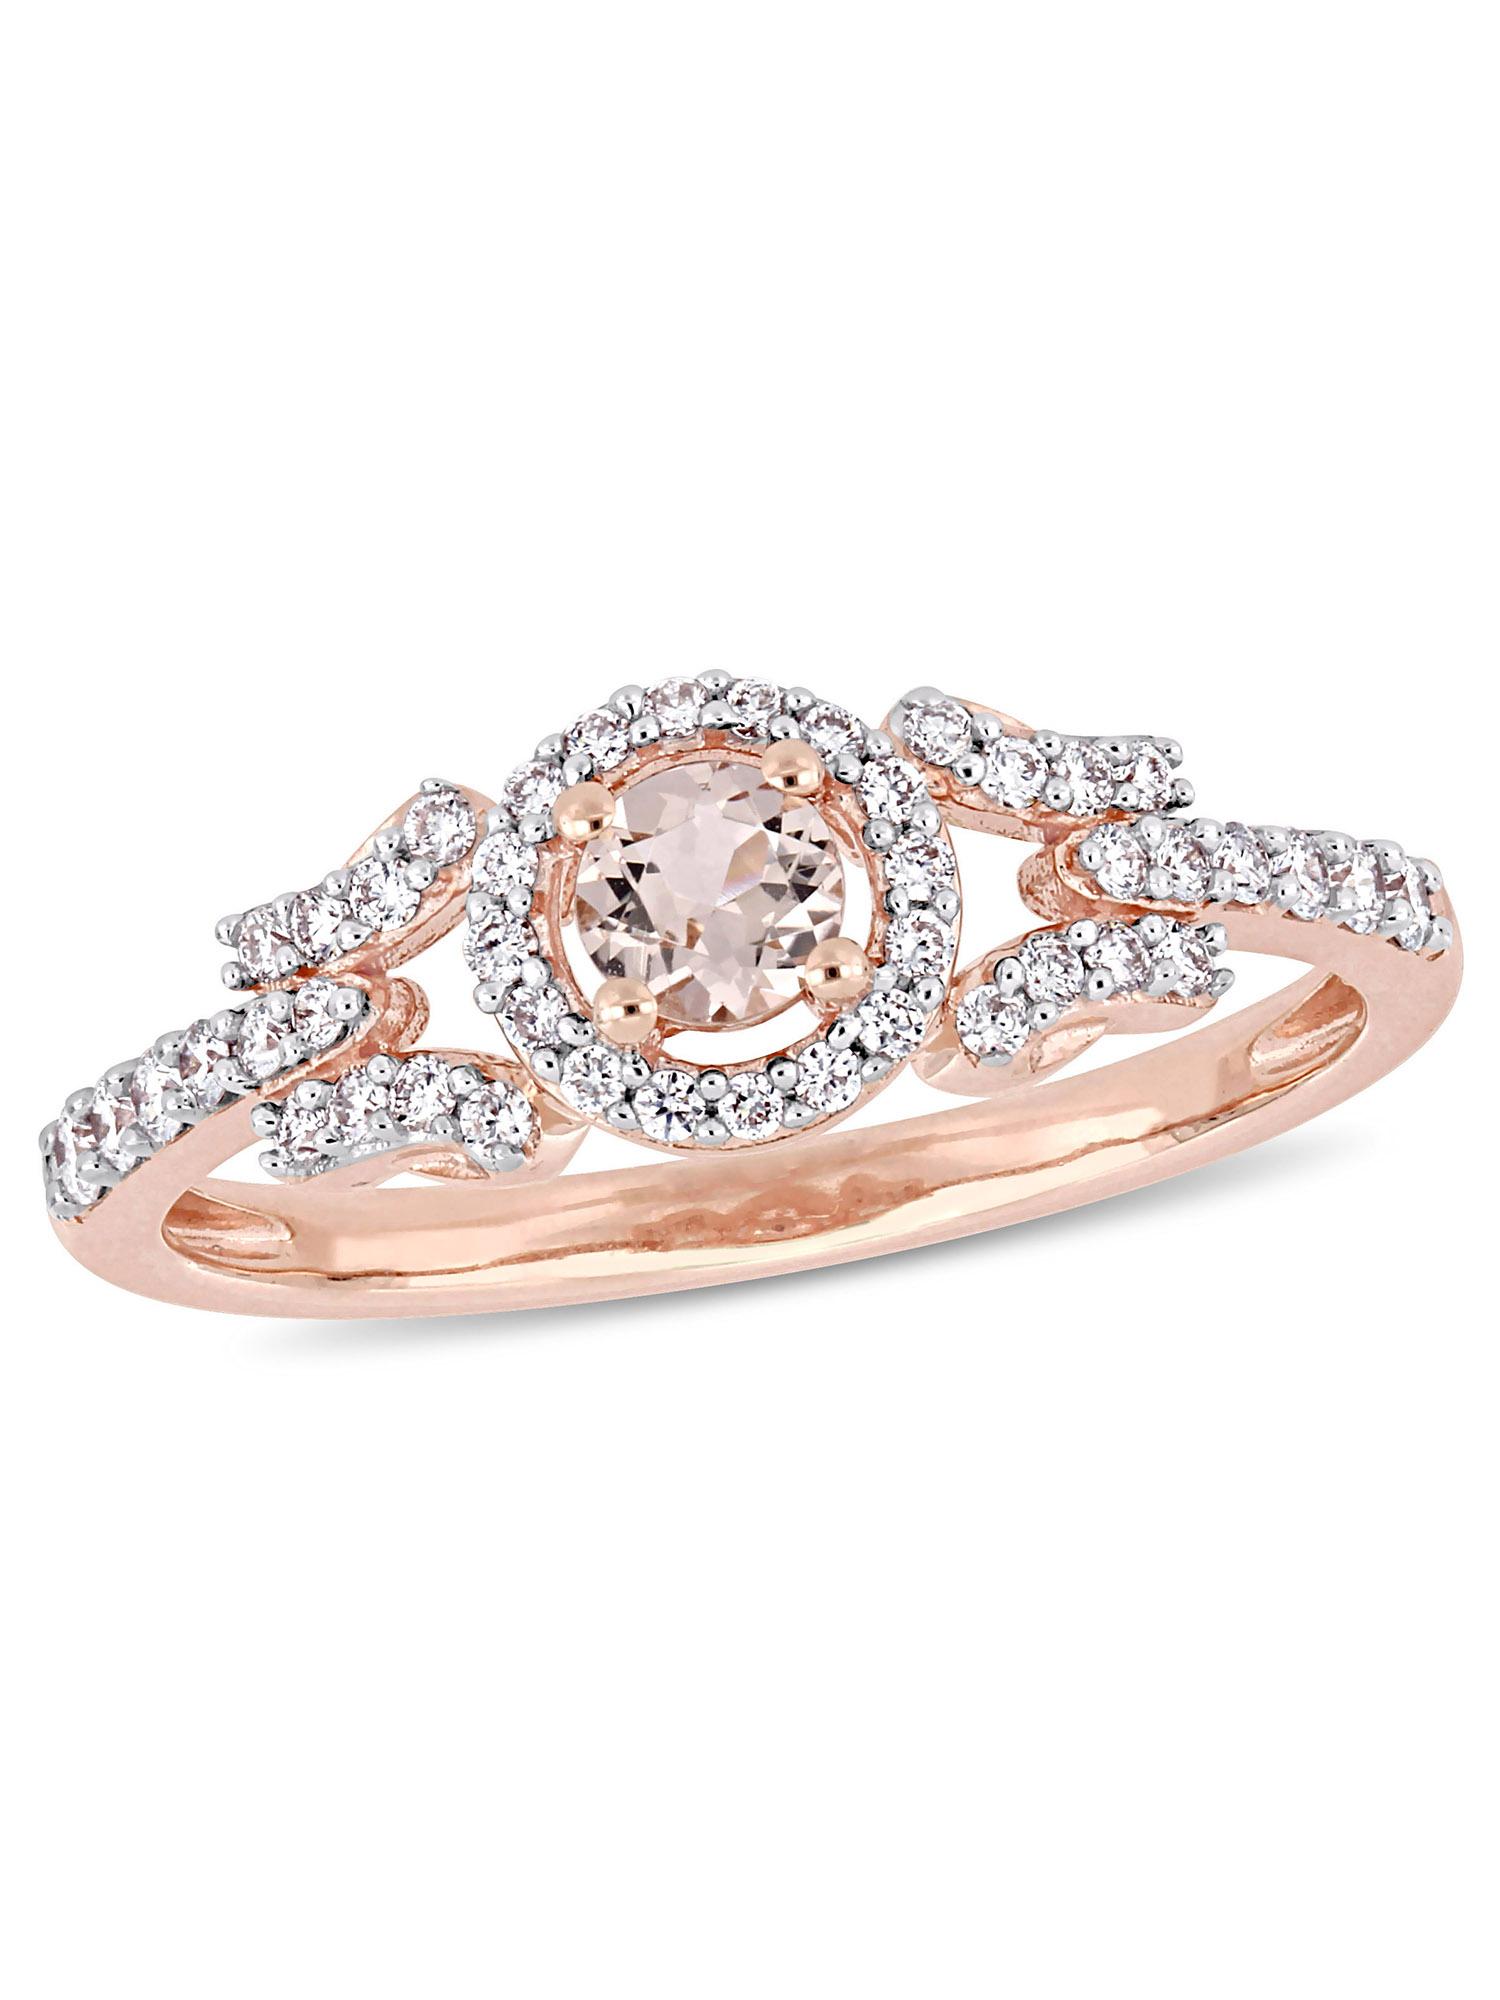 Tangelo 1/4 Carat T.G.W. Morganite and 1/4 Carat T.W. Diamond 14kt Rose Gold Halo Promise Ring